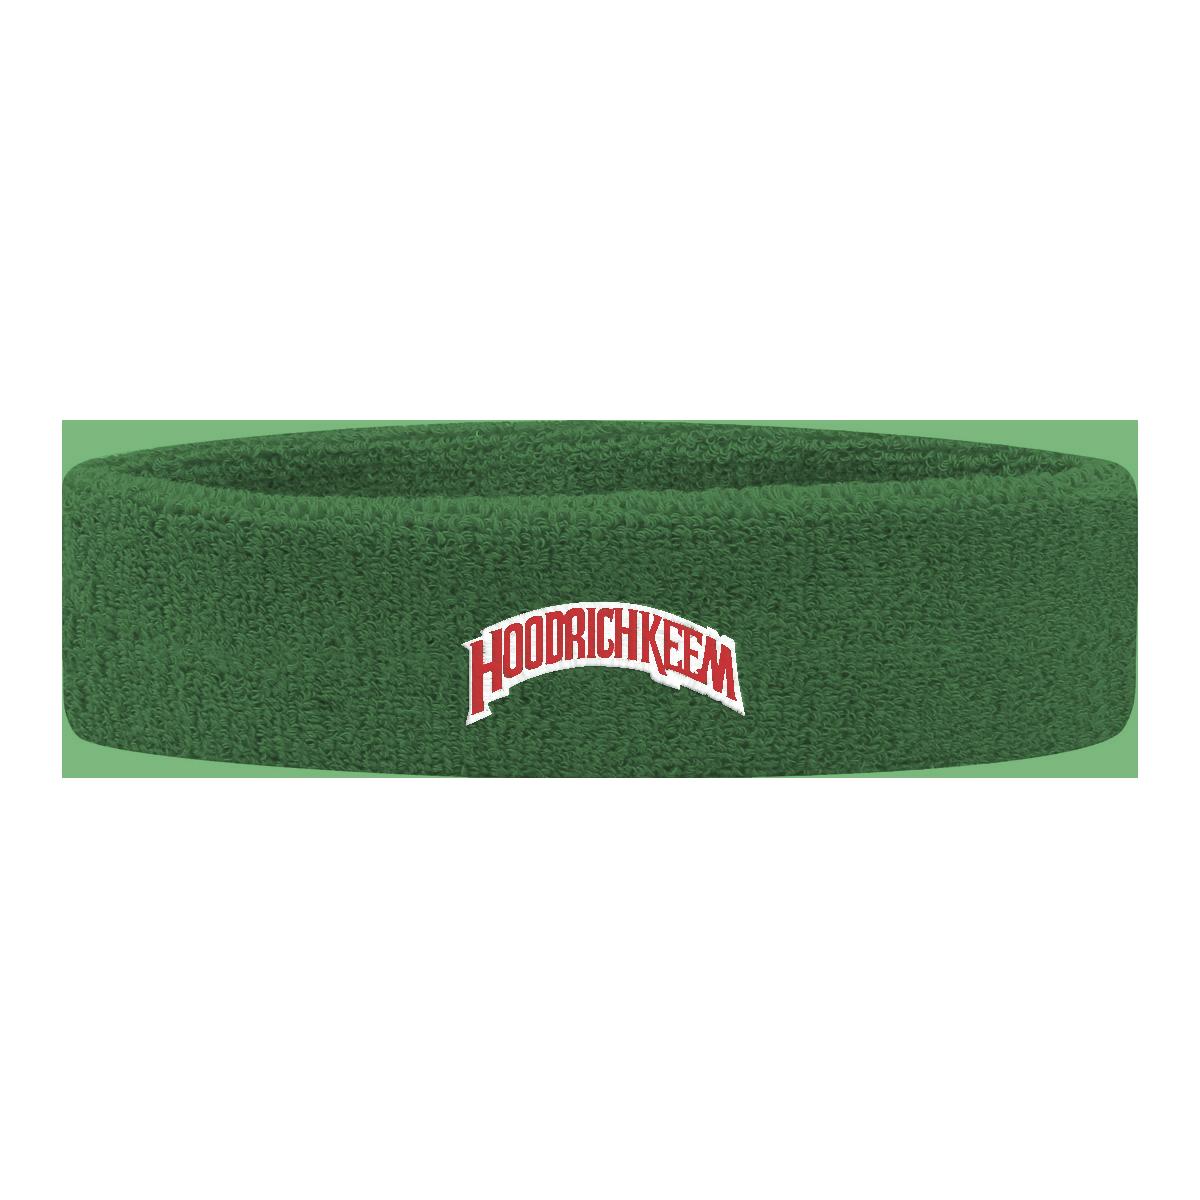 HoodrichKeem Headband [Green]